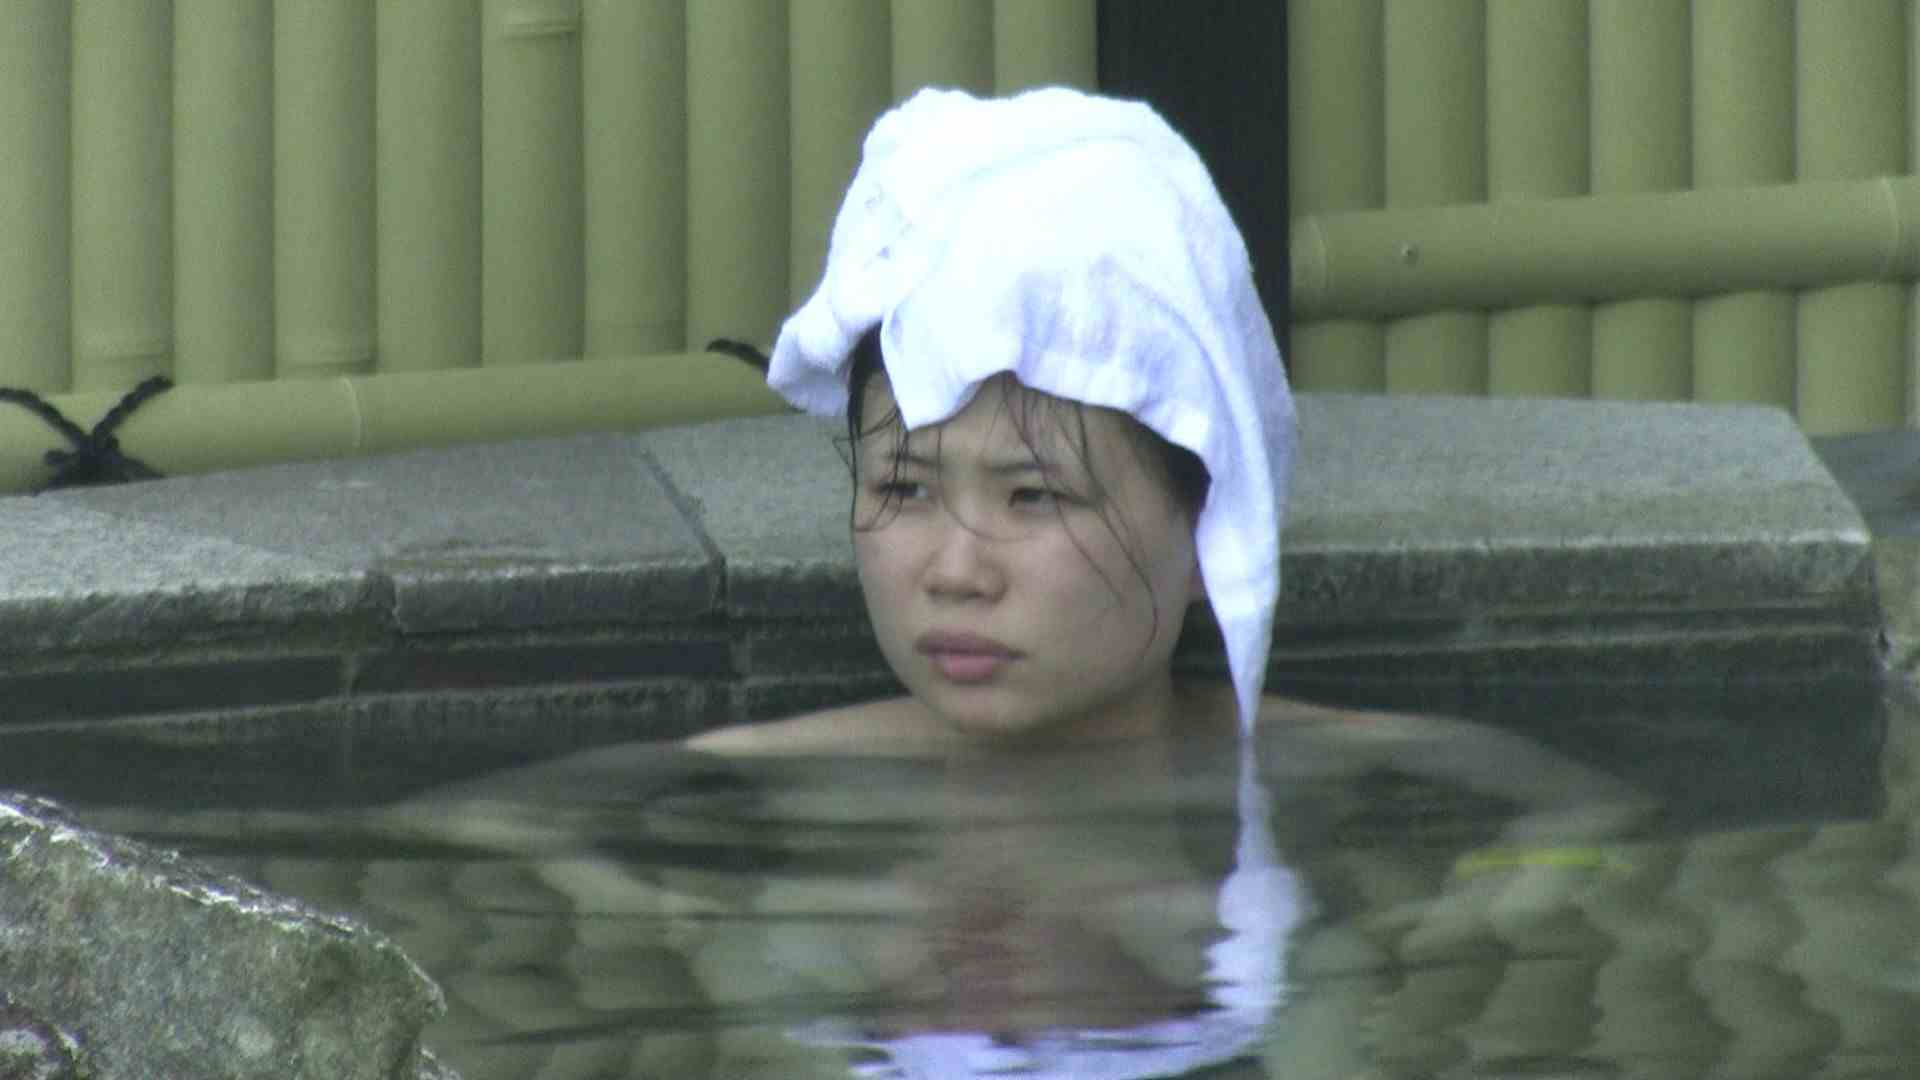 Aquaな露天風呂Vol.183 エッチな盗撮 ワレメ無修正動画無料 106pic 93